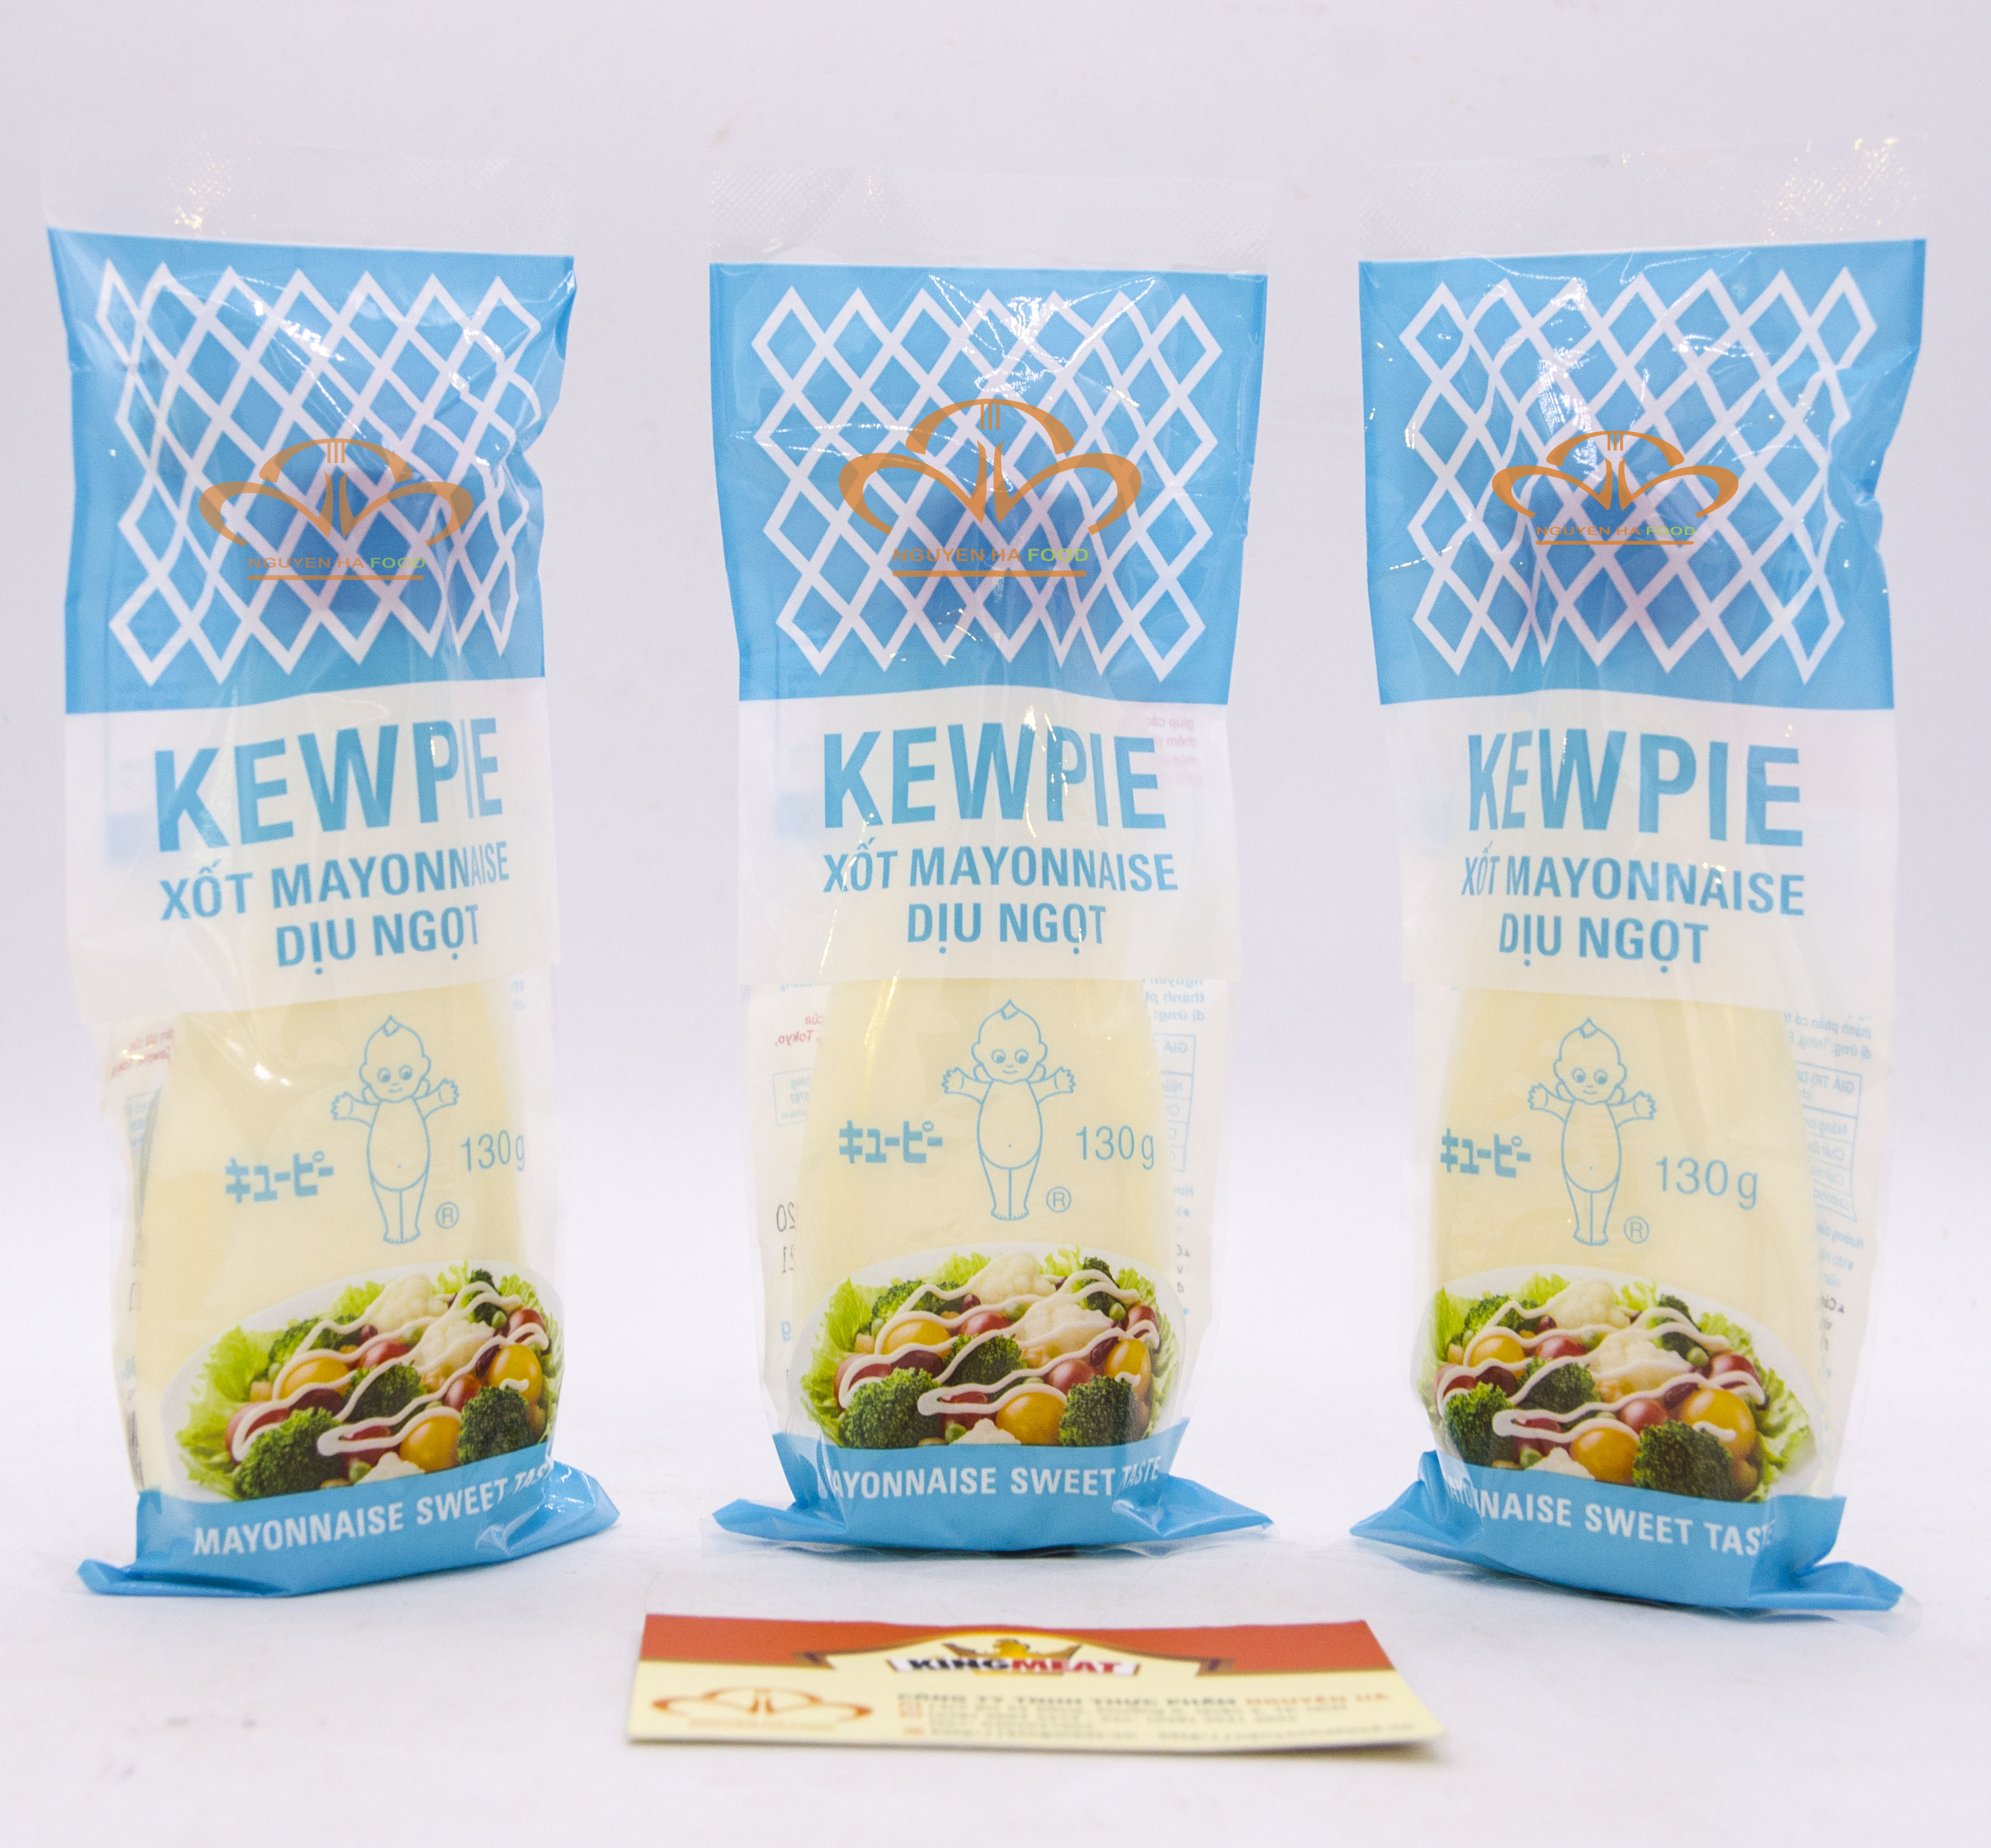 kewpie-xot-diu-ngot-130gr-1